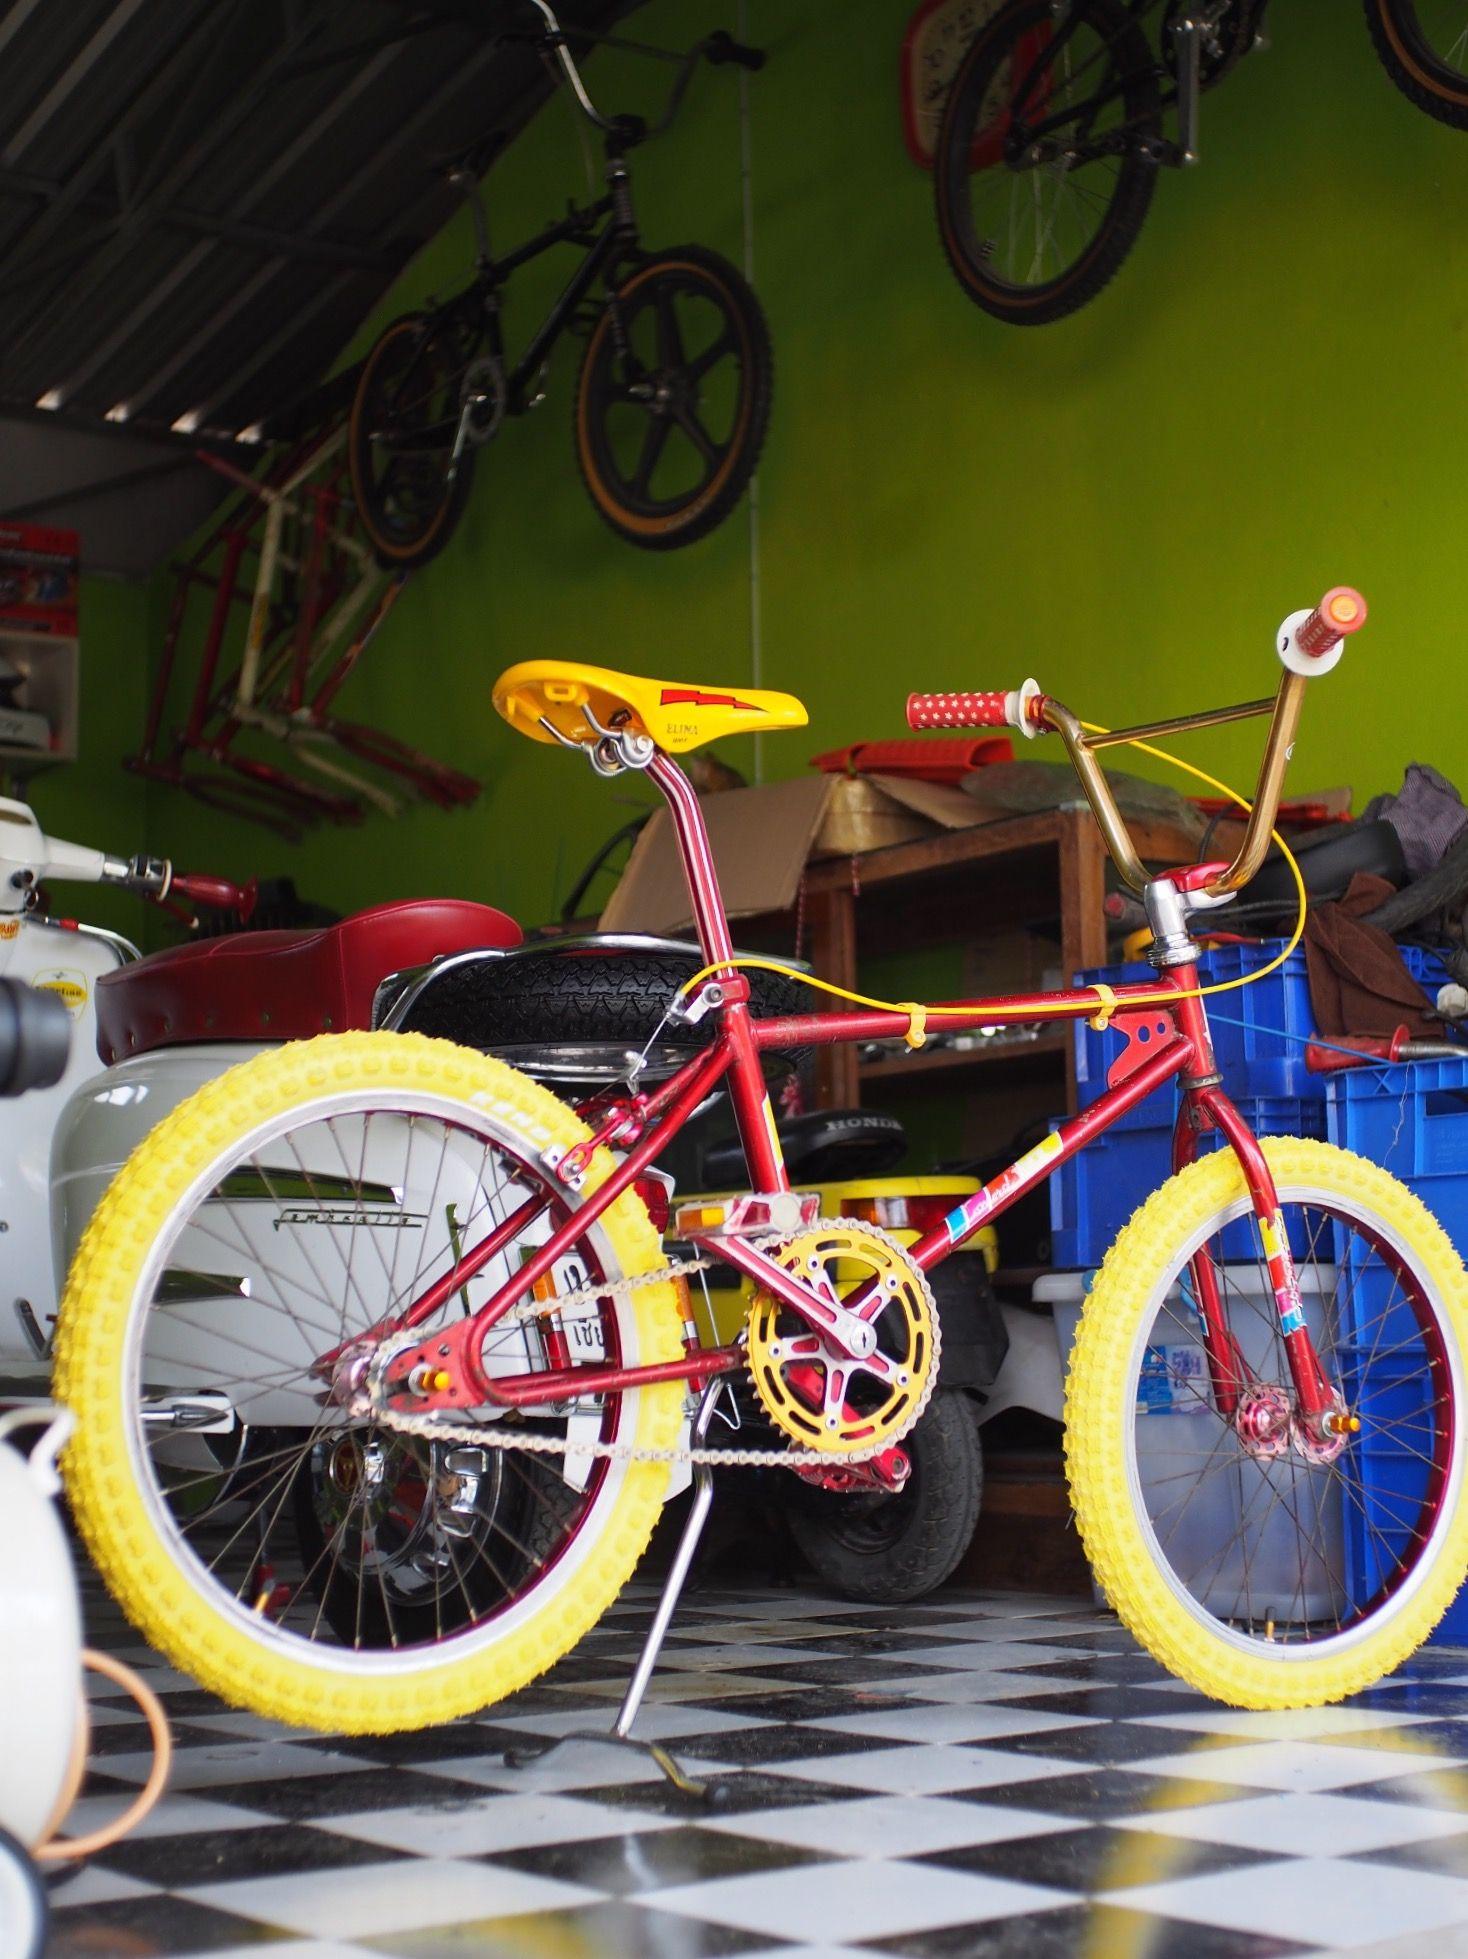 NOS VINTAGE GT PRO PERFORMER FRAME STICKER BMX FREESTYLEBMX RACING DECAL